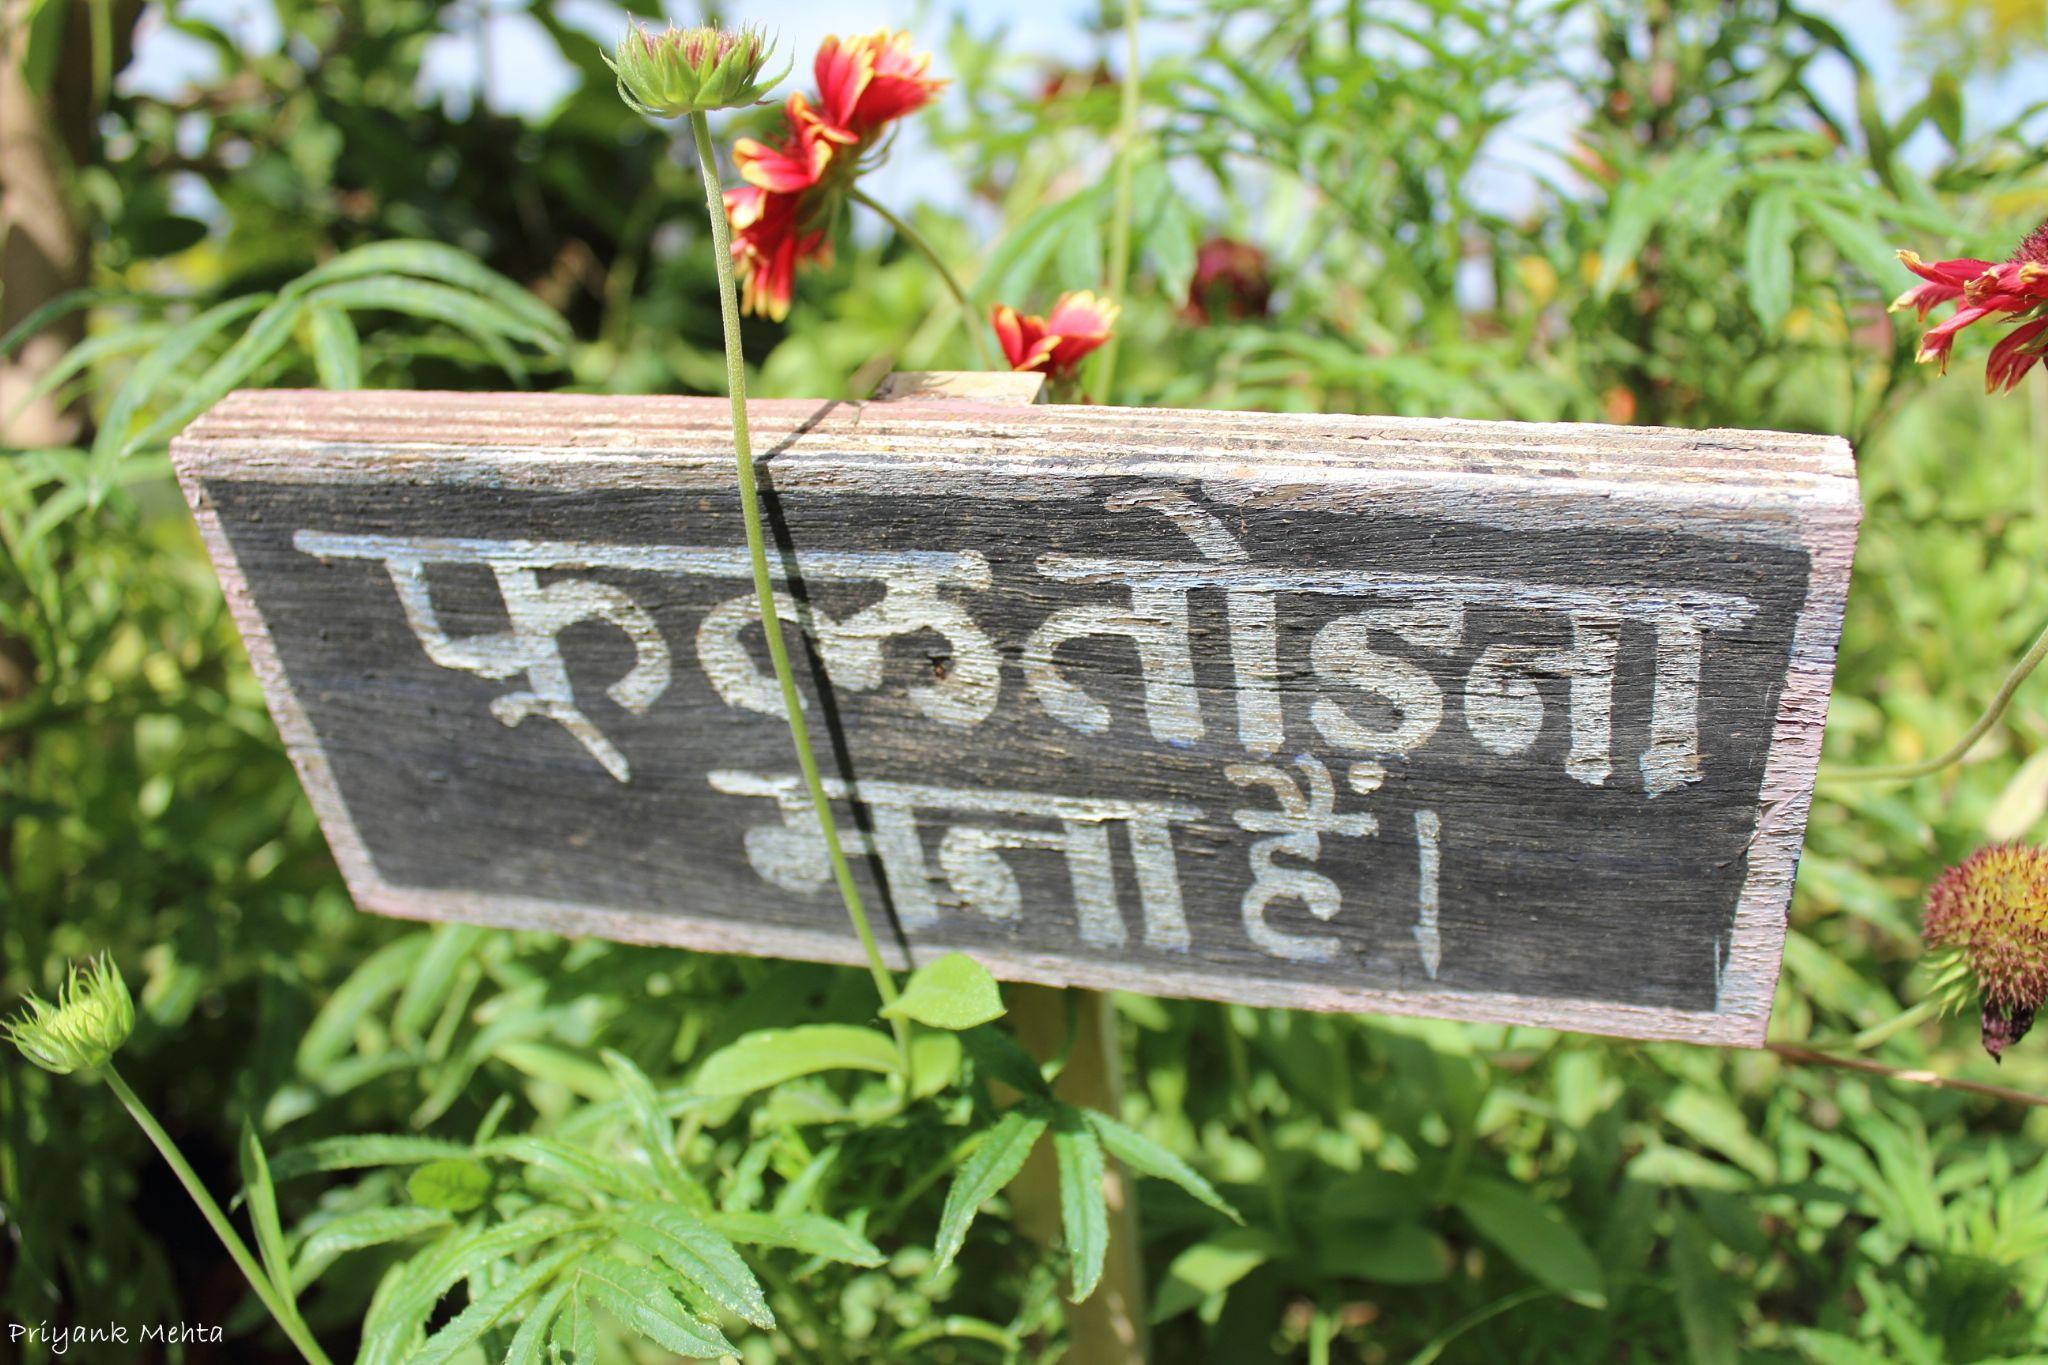 Do not pluck flowers by Priyank J Mehta